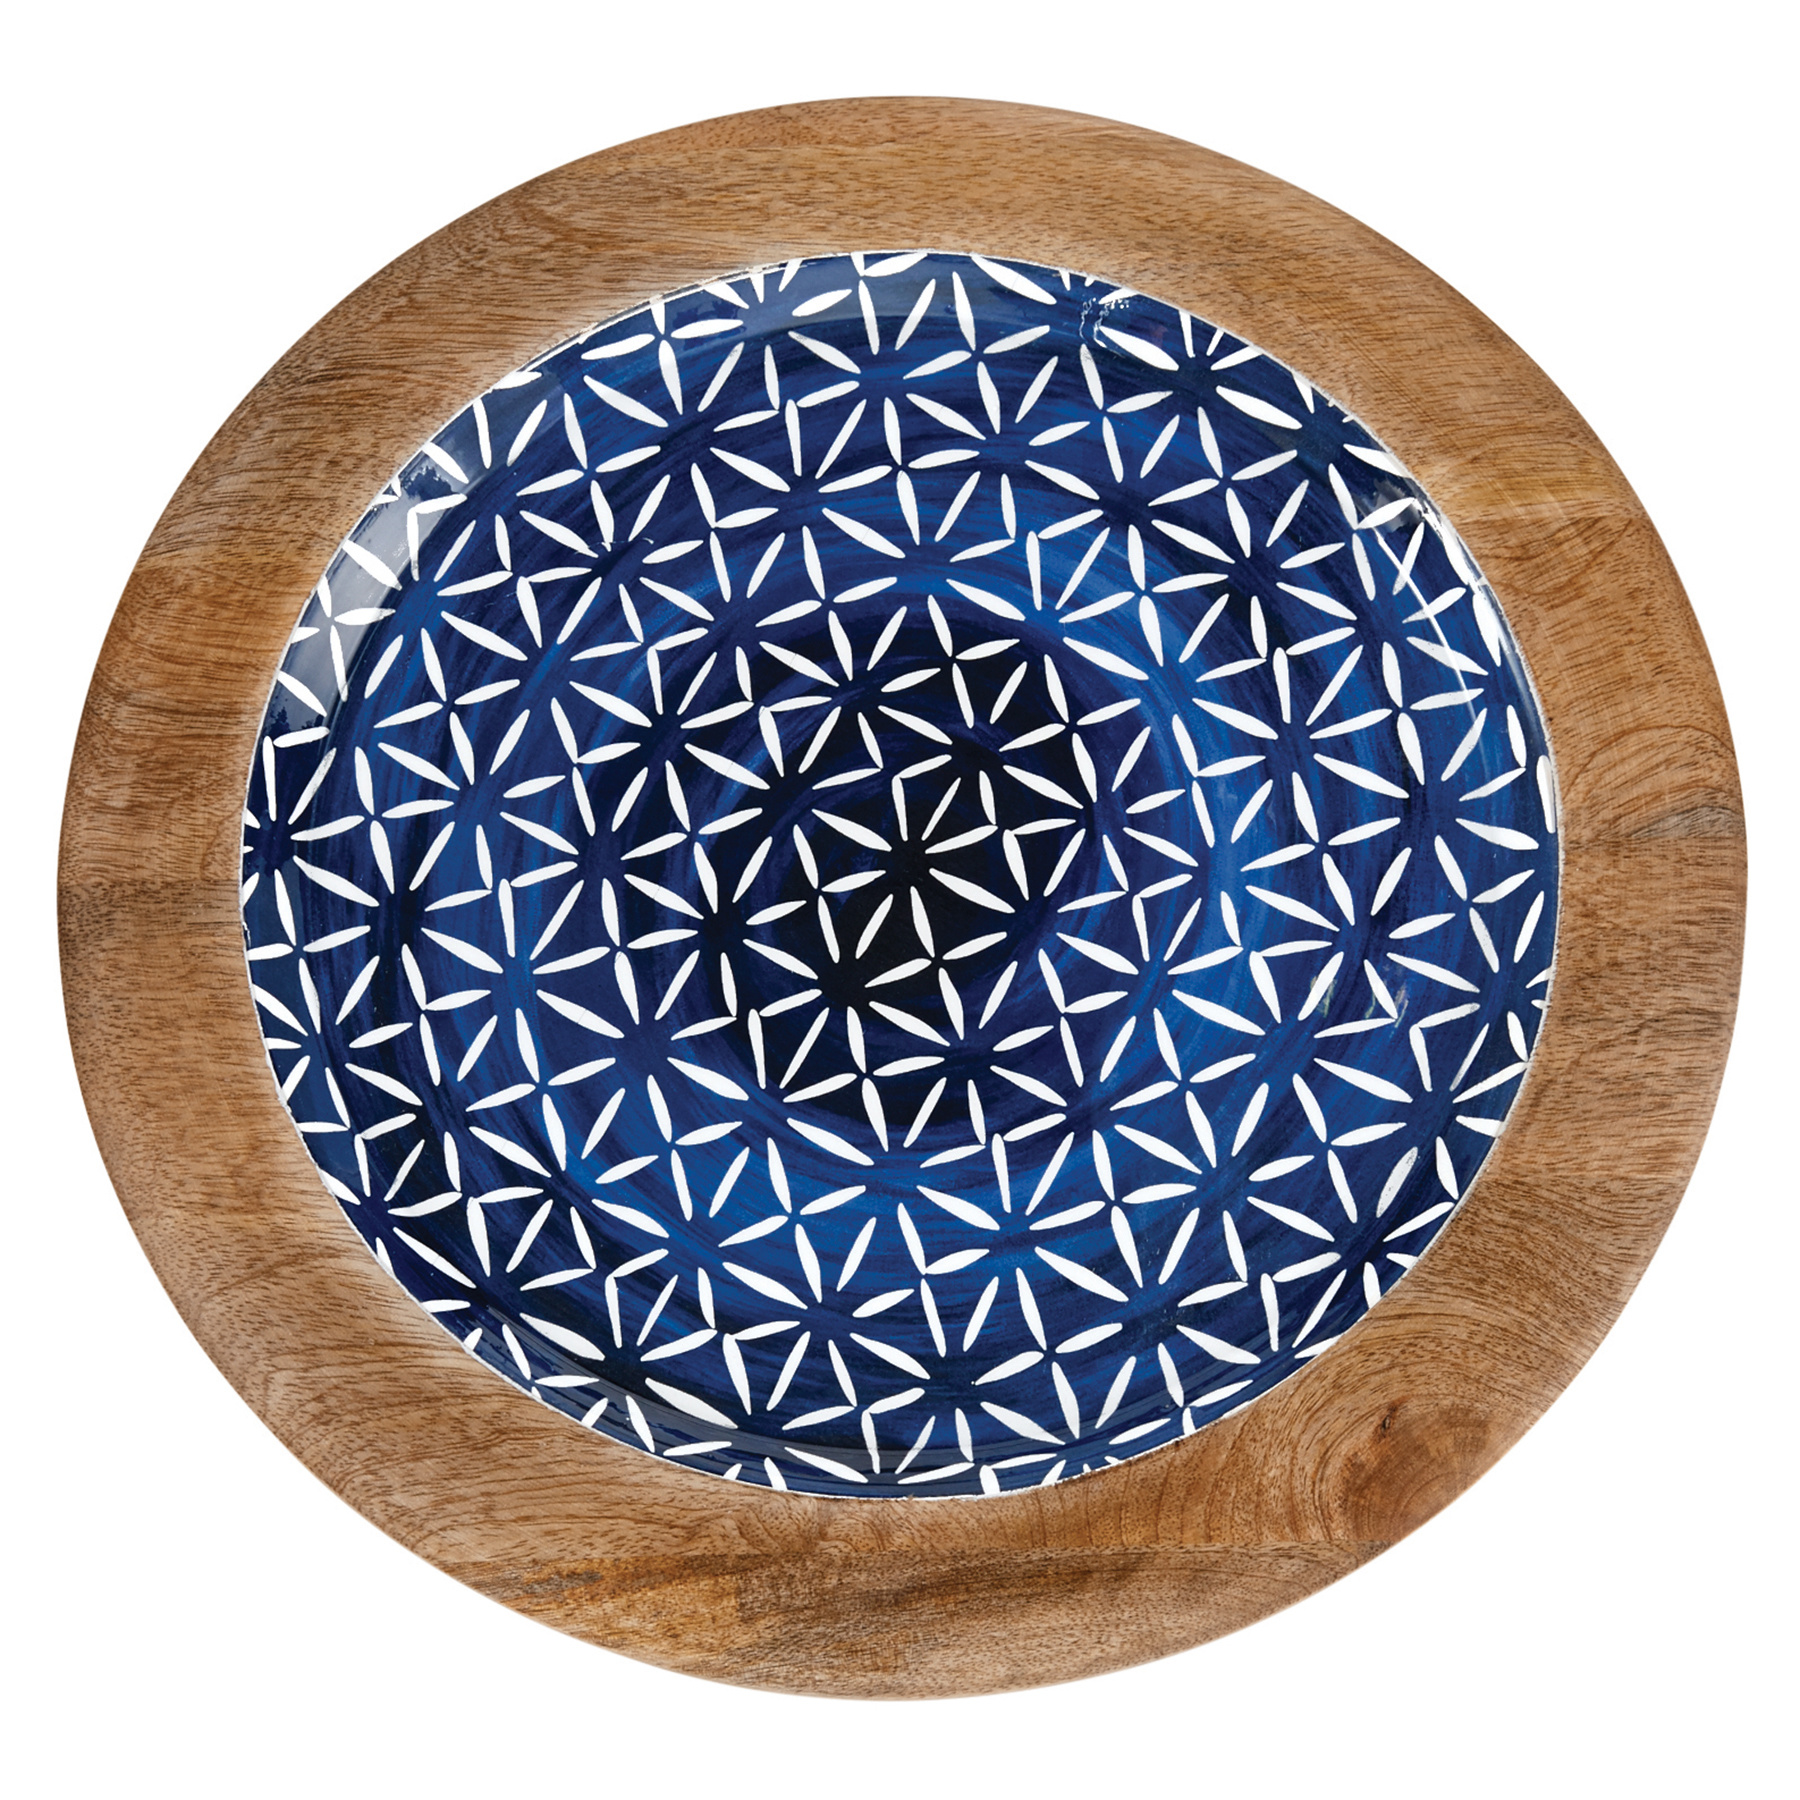 Mud Pie Indigo wood tray - Small